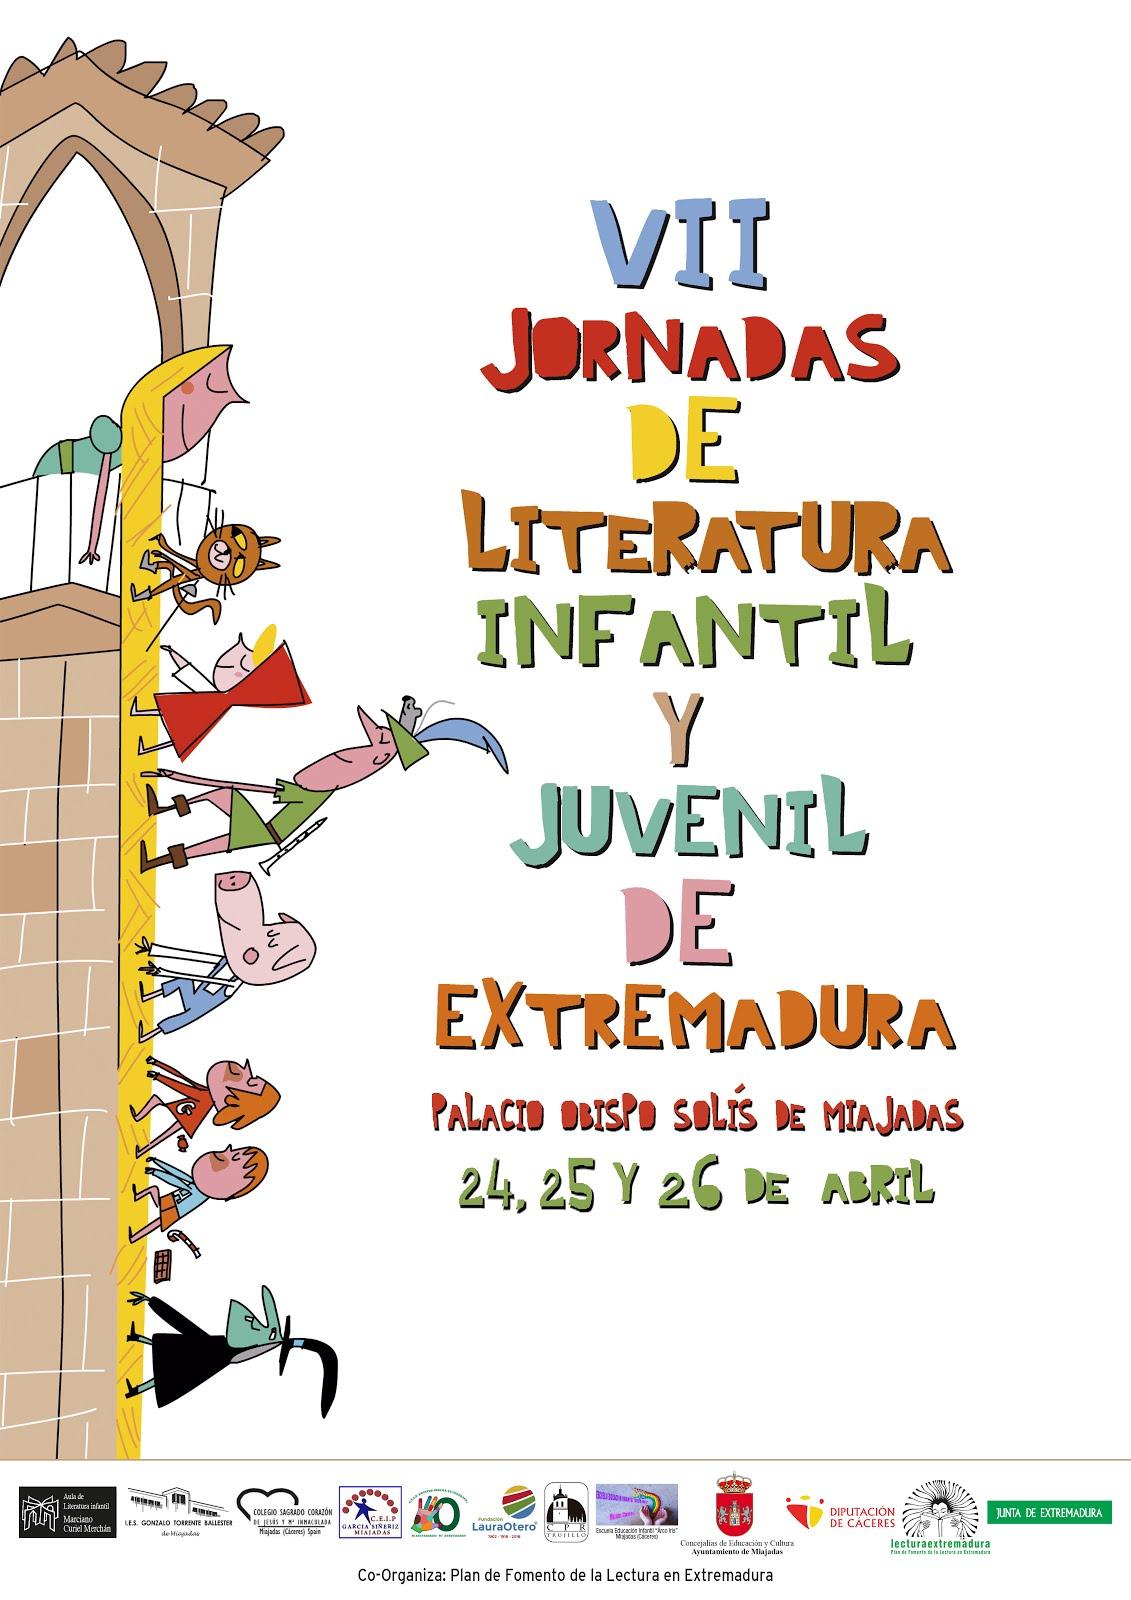 VII JORNADAS DE LITERATURA INFANTIL Y JUVENIL